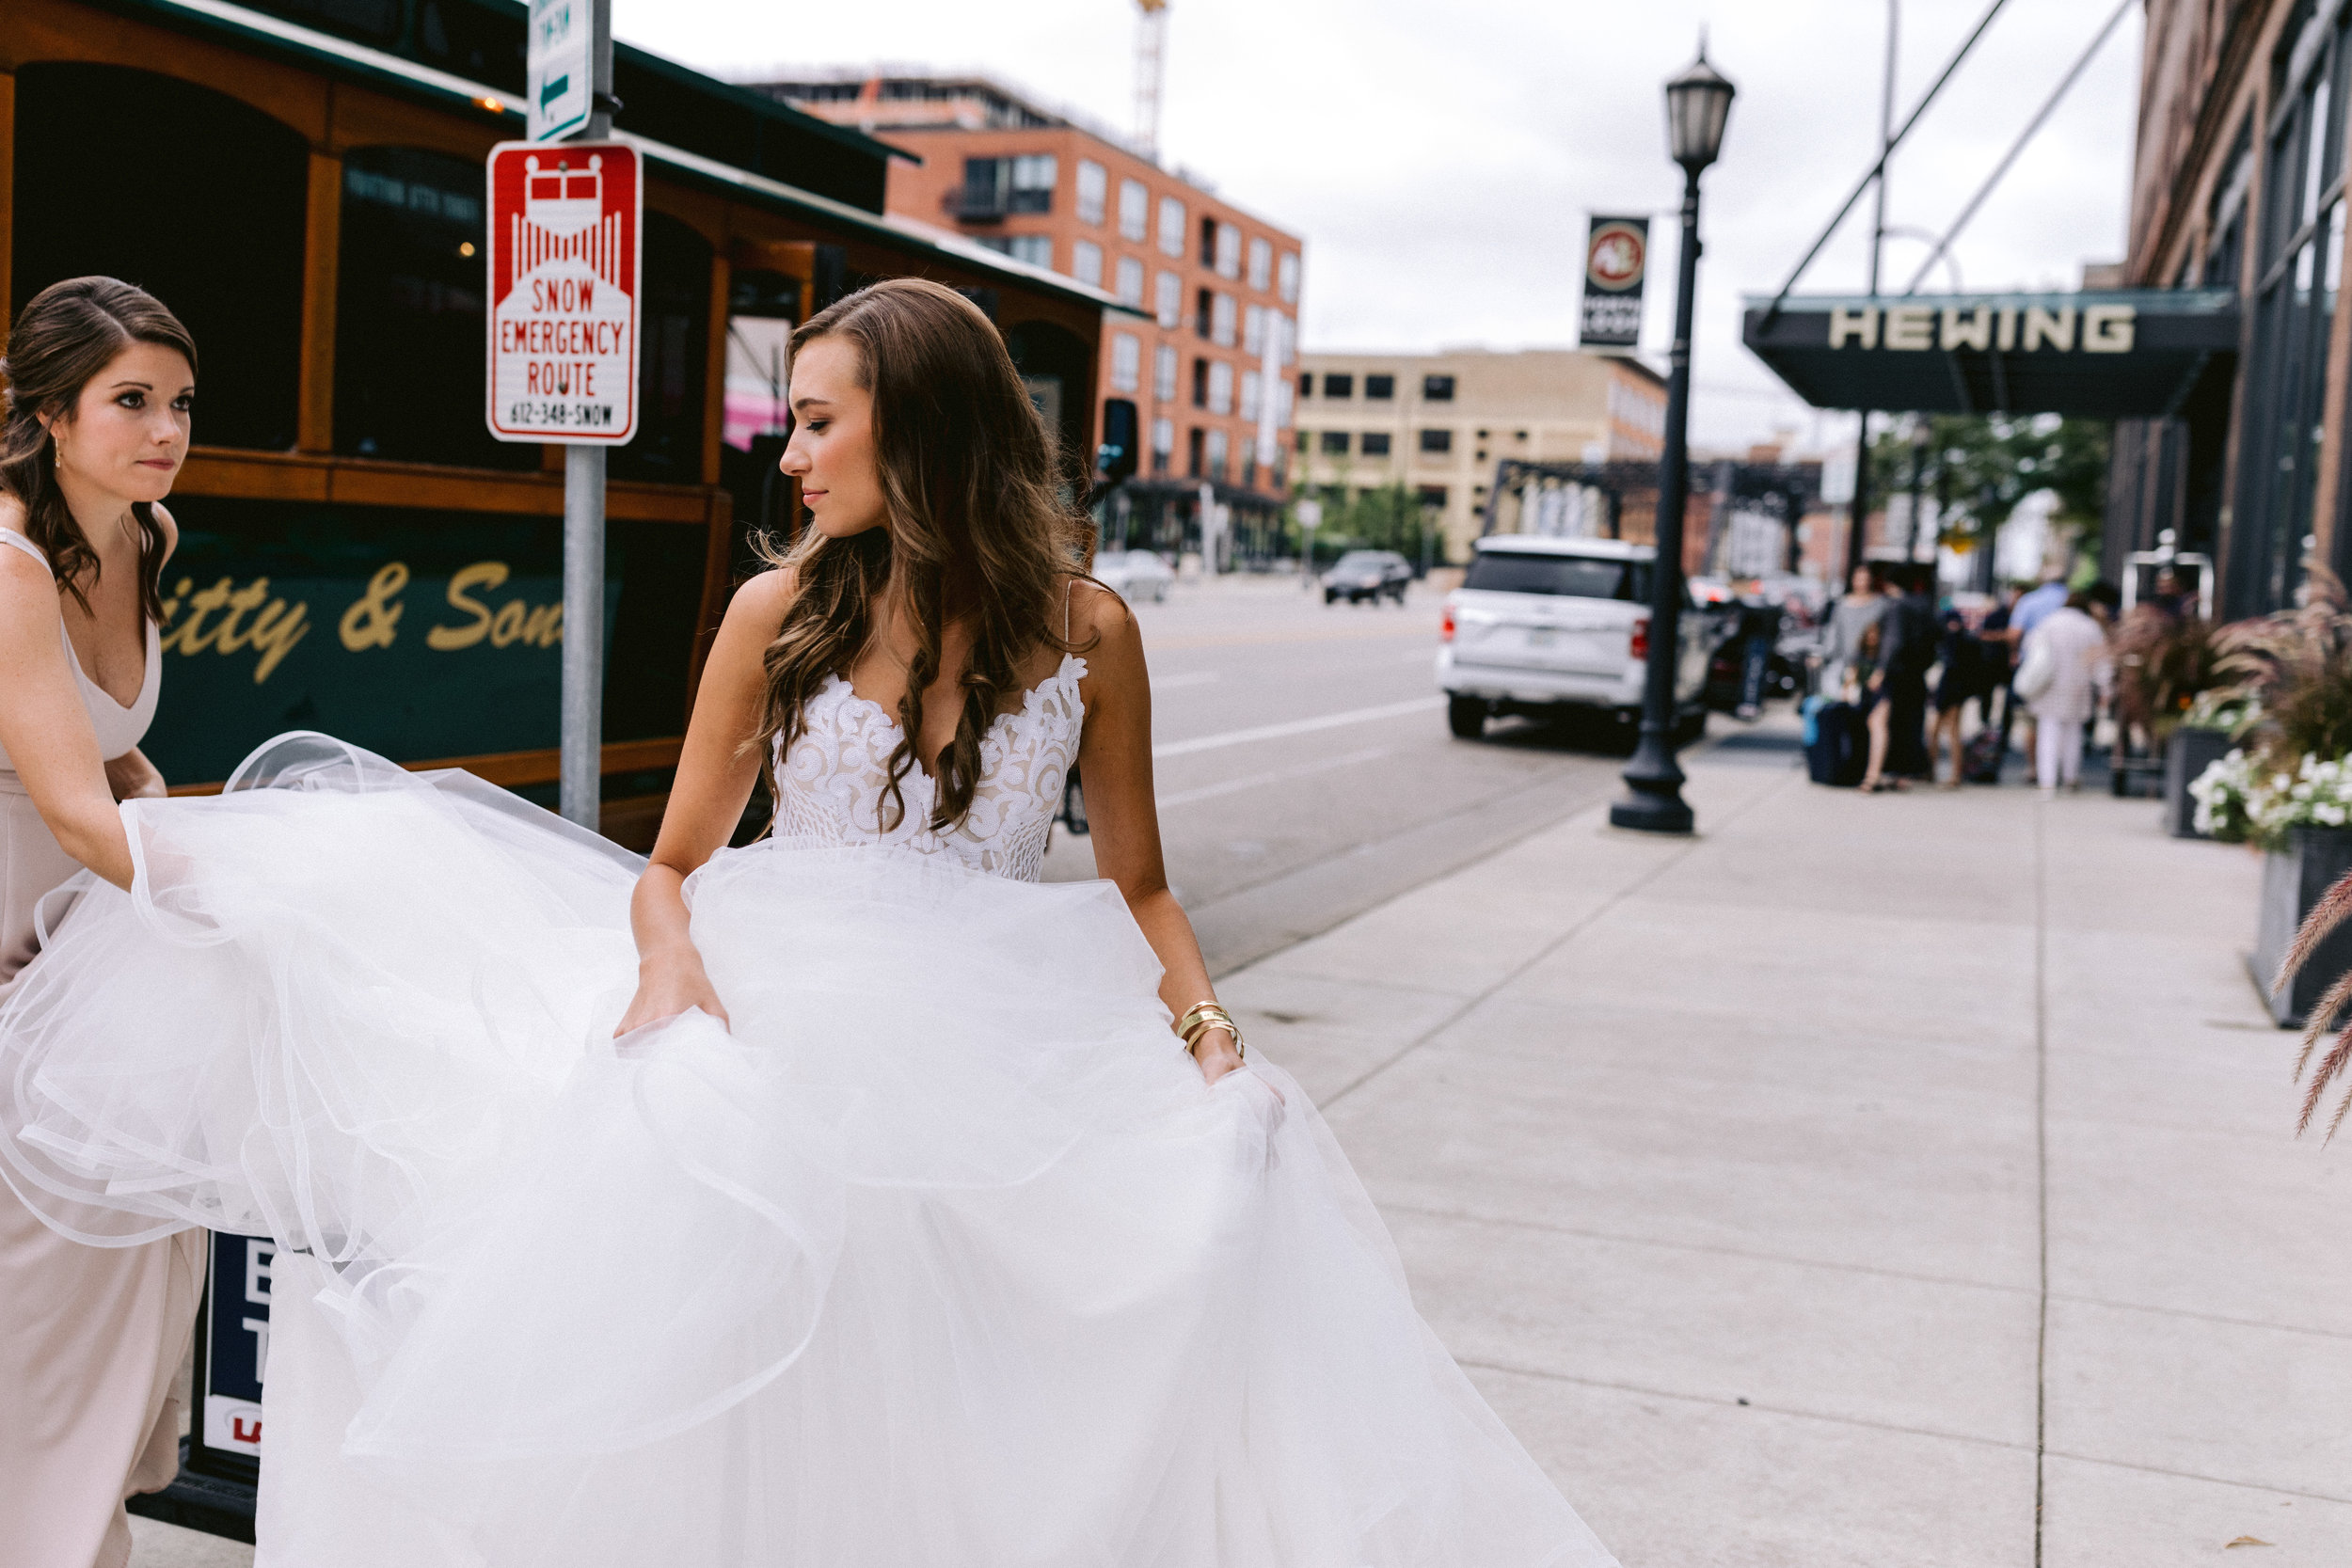 solarartsbychowgirlswedding-5.jpg